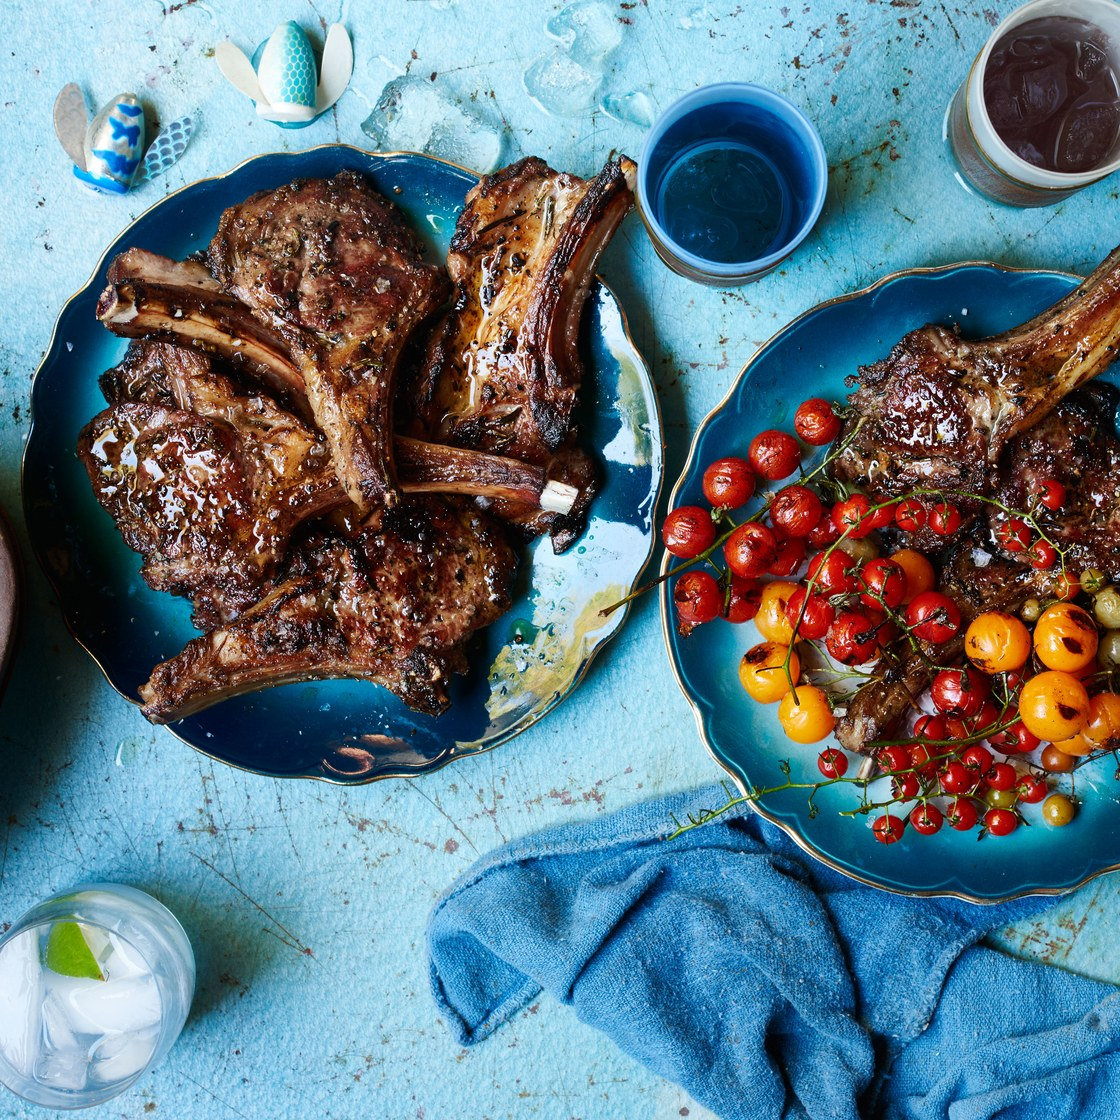 lamb-chops-scottadito-with-charred-cherry-tomatoes.jpg